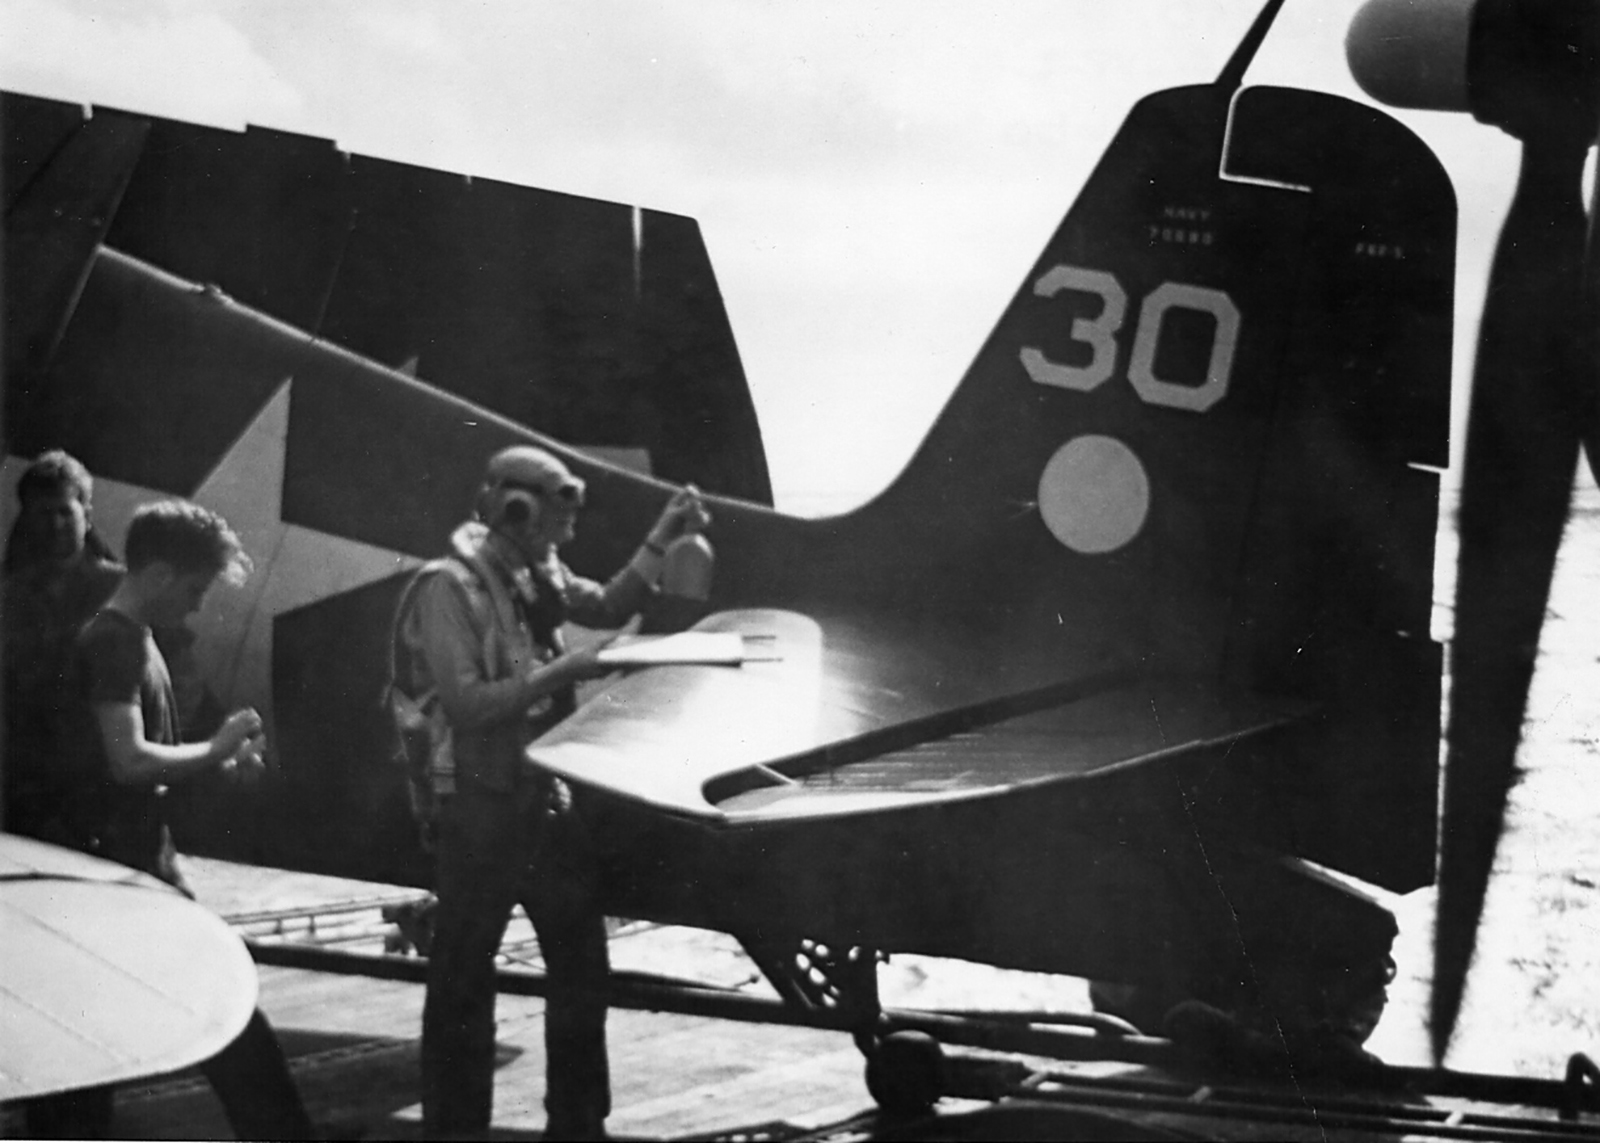 Grumman F6F 3 Hellcat VF 2 White 30 CV 12 USS Hornet June 1944 01